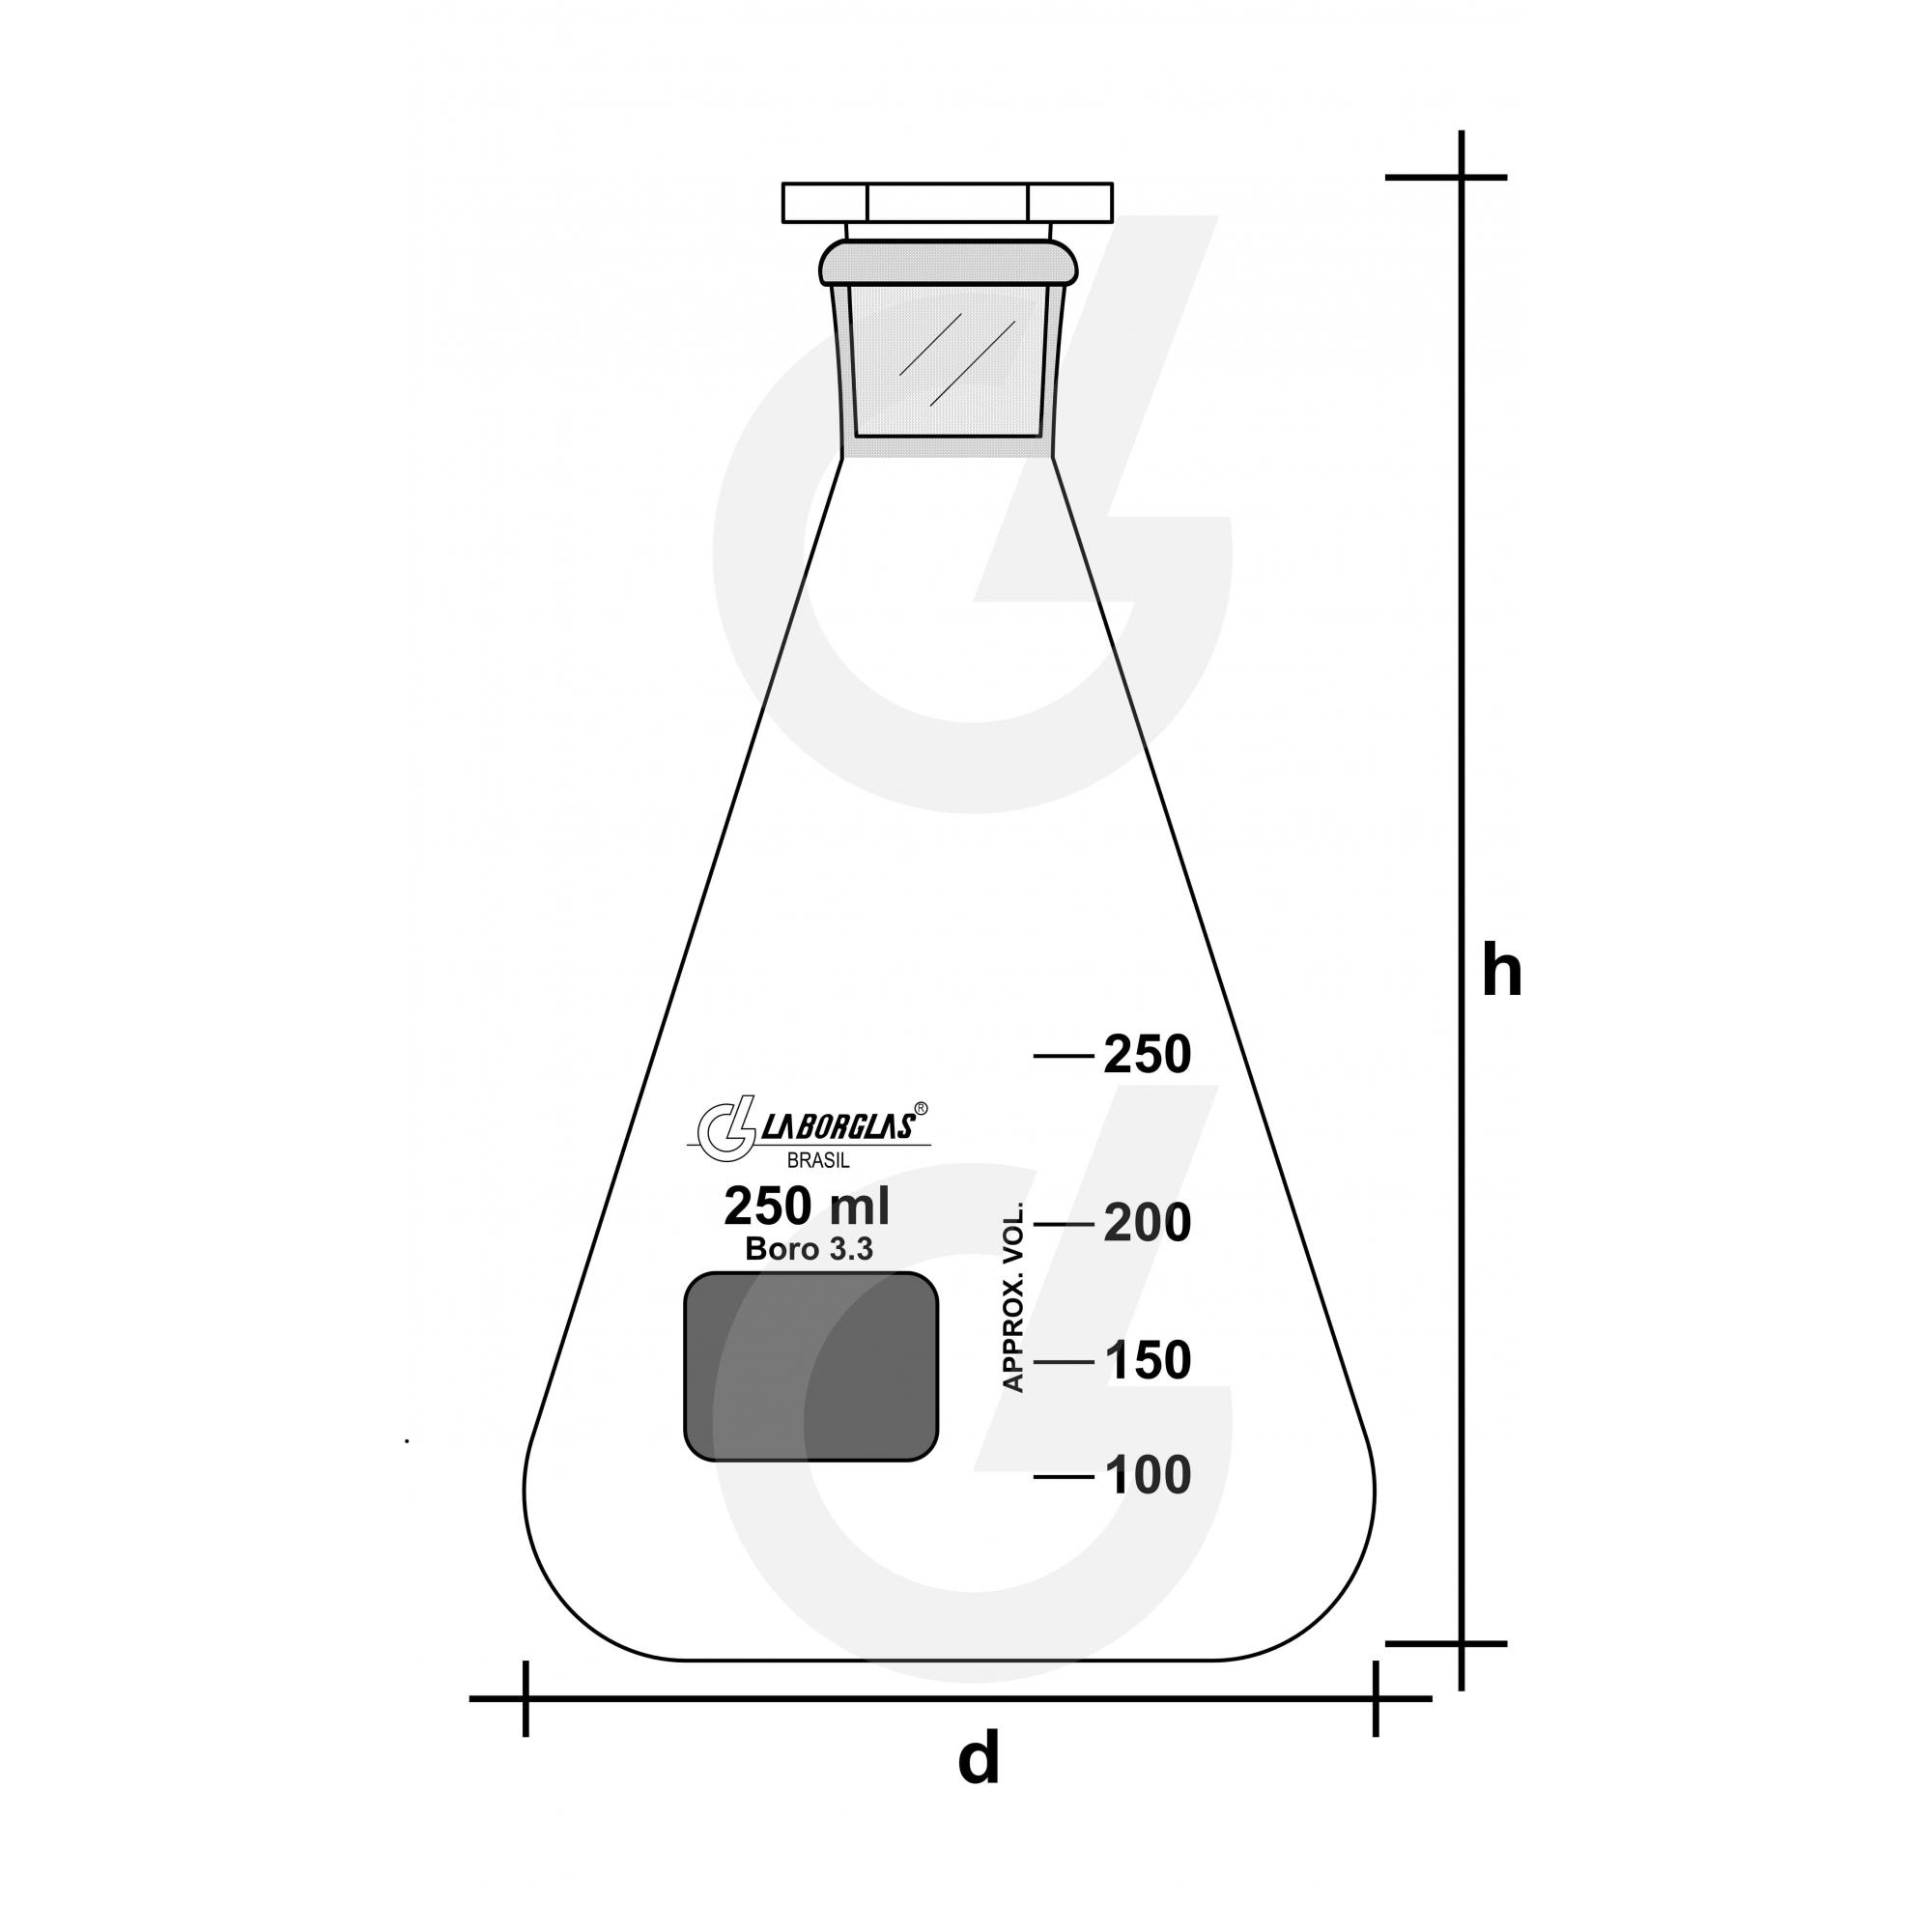 FRASCO ERLENMEYER C/ ROLHA VIDRO 2000 ML - Laborglas - Cód. 91216633